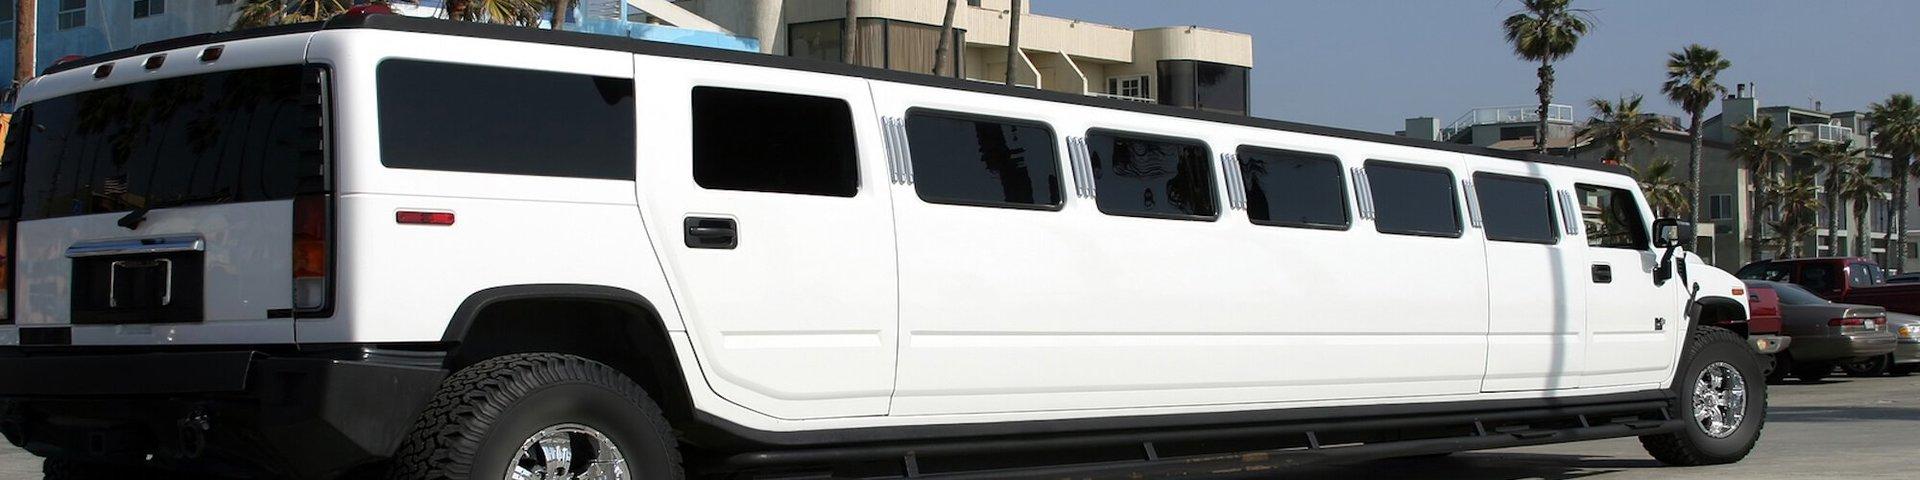 San Diego SUV Limo